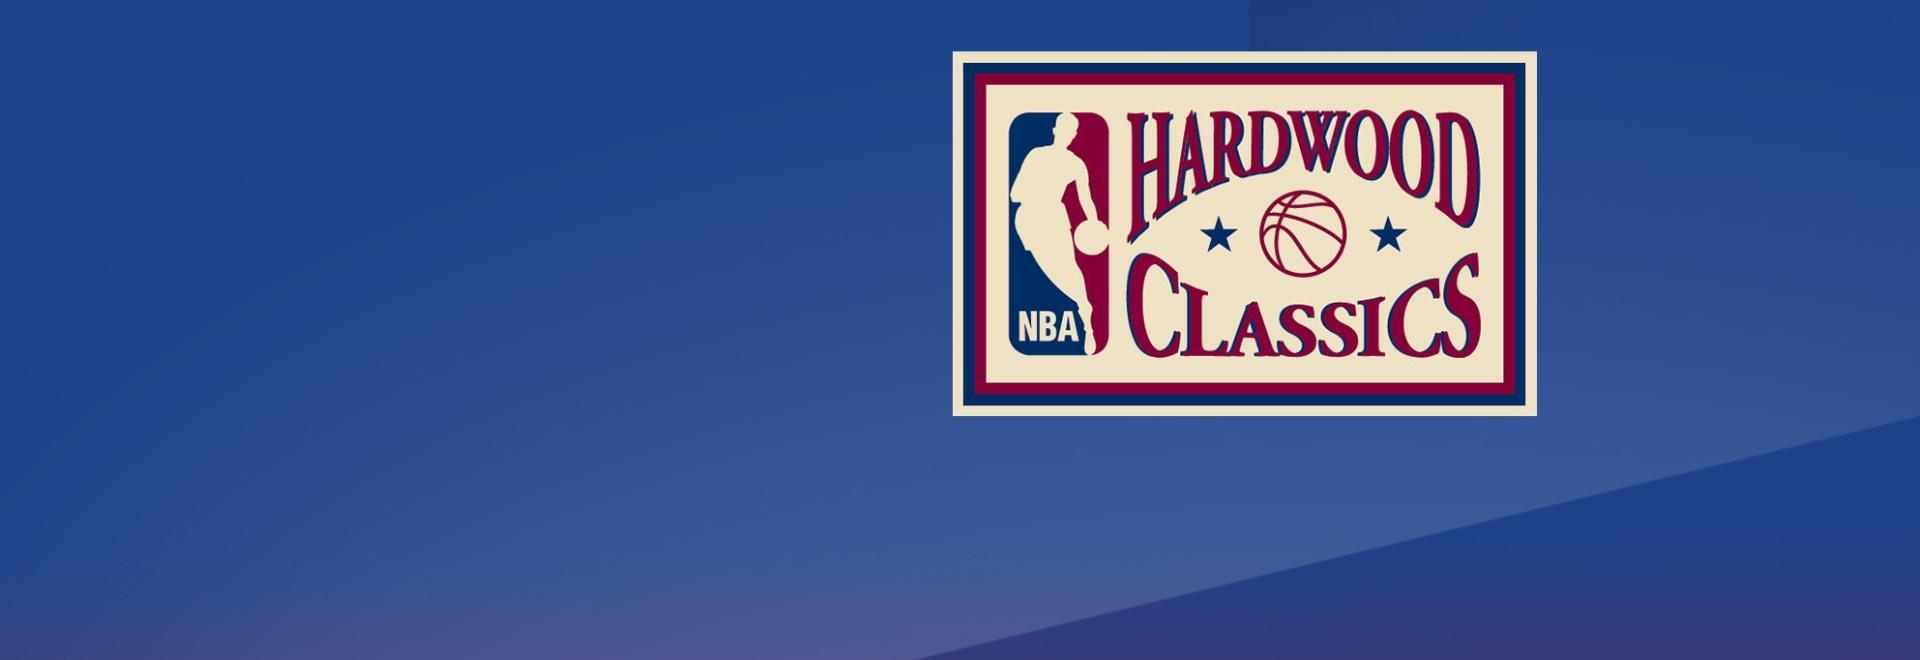 Celtics - Lakers 1987. Finals Game 6